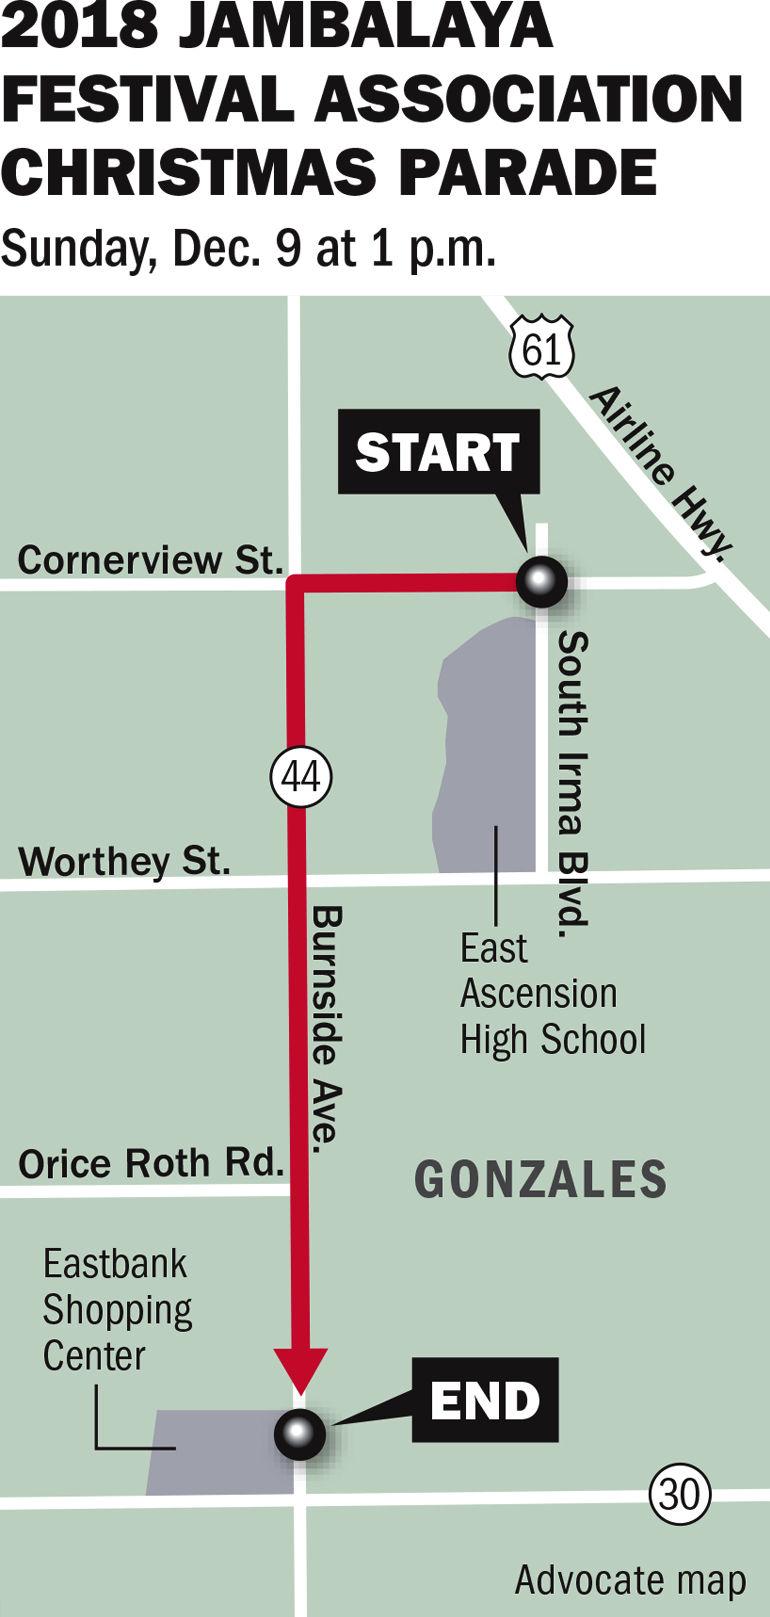 Gonzales Texas Christmas Parade 2020 Despite Gonzales Christmas Parade 'monkey wrench' on social media